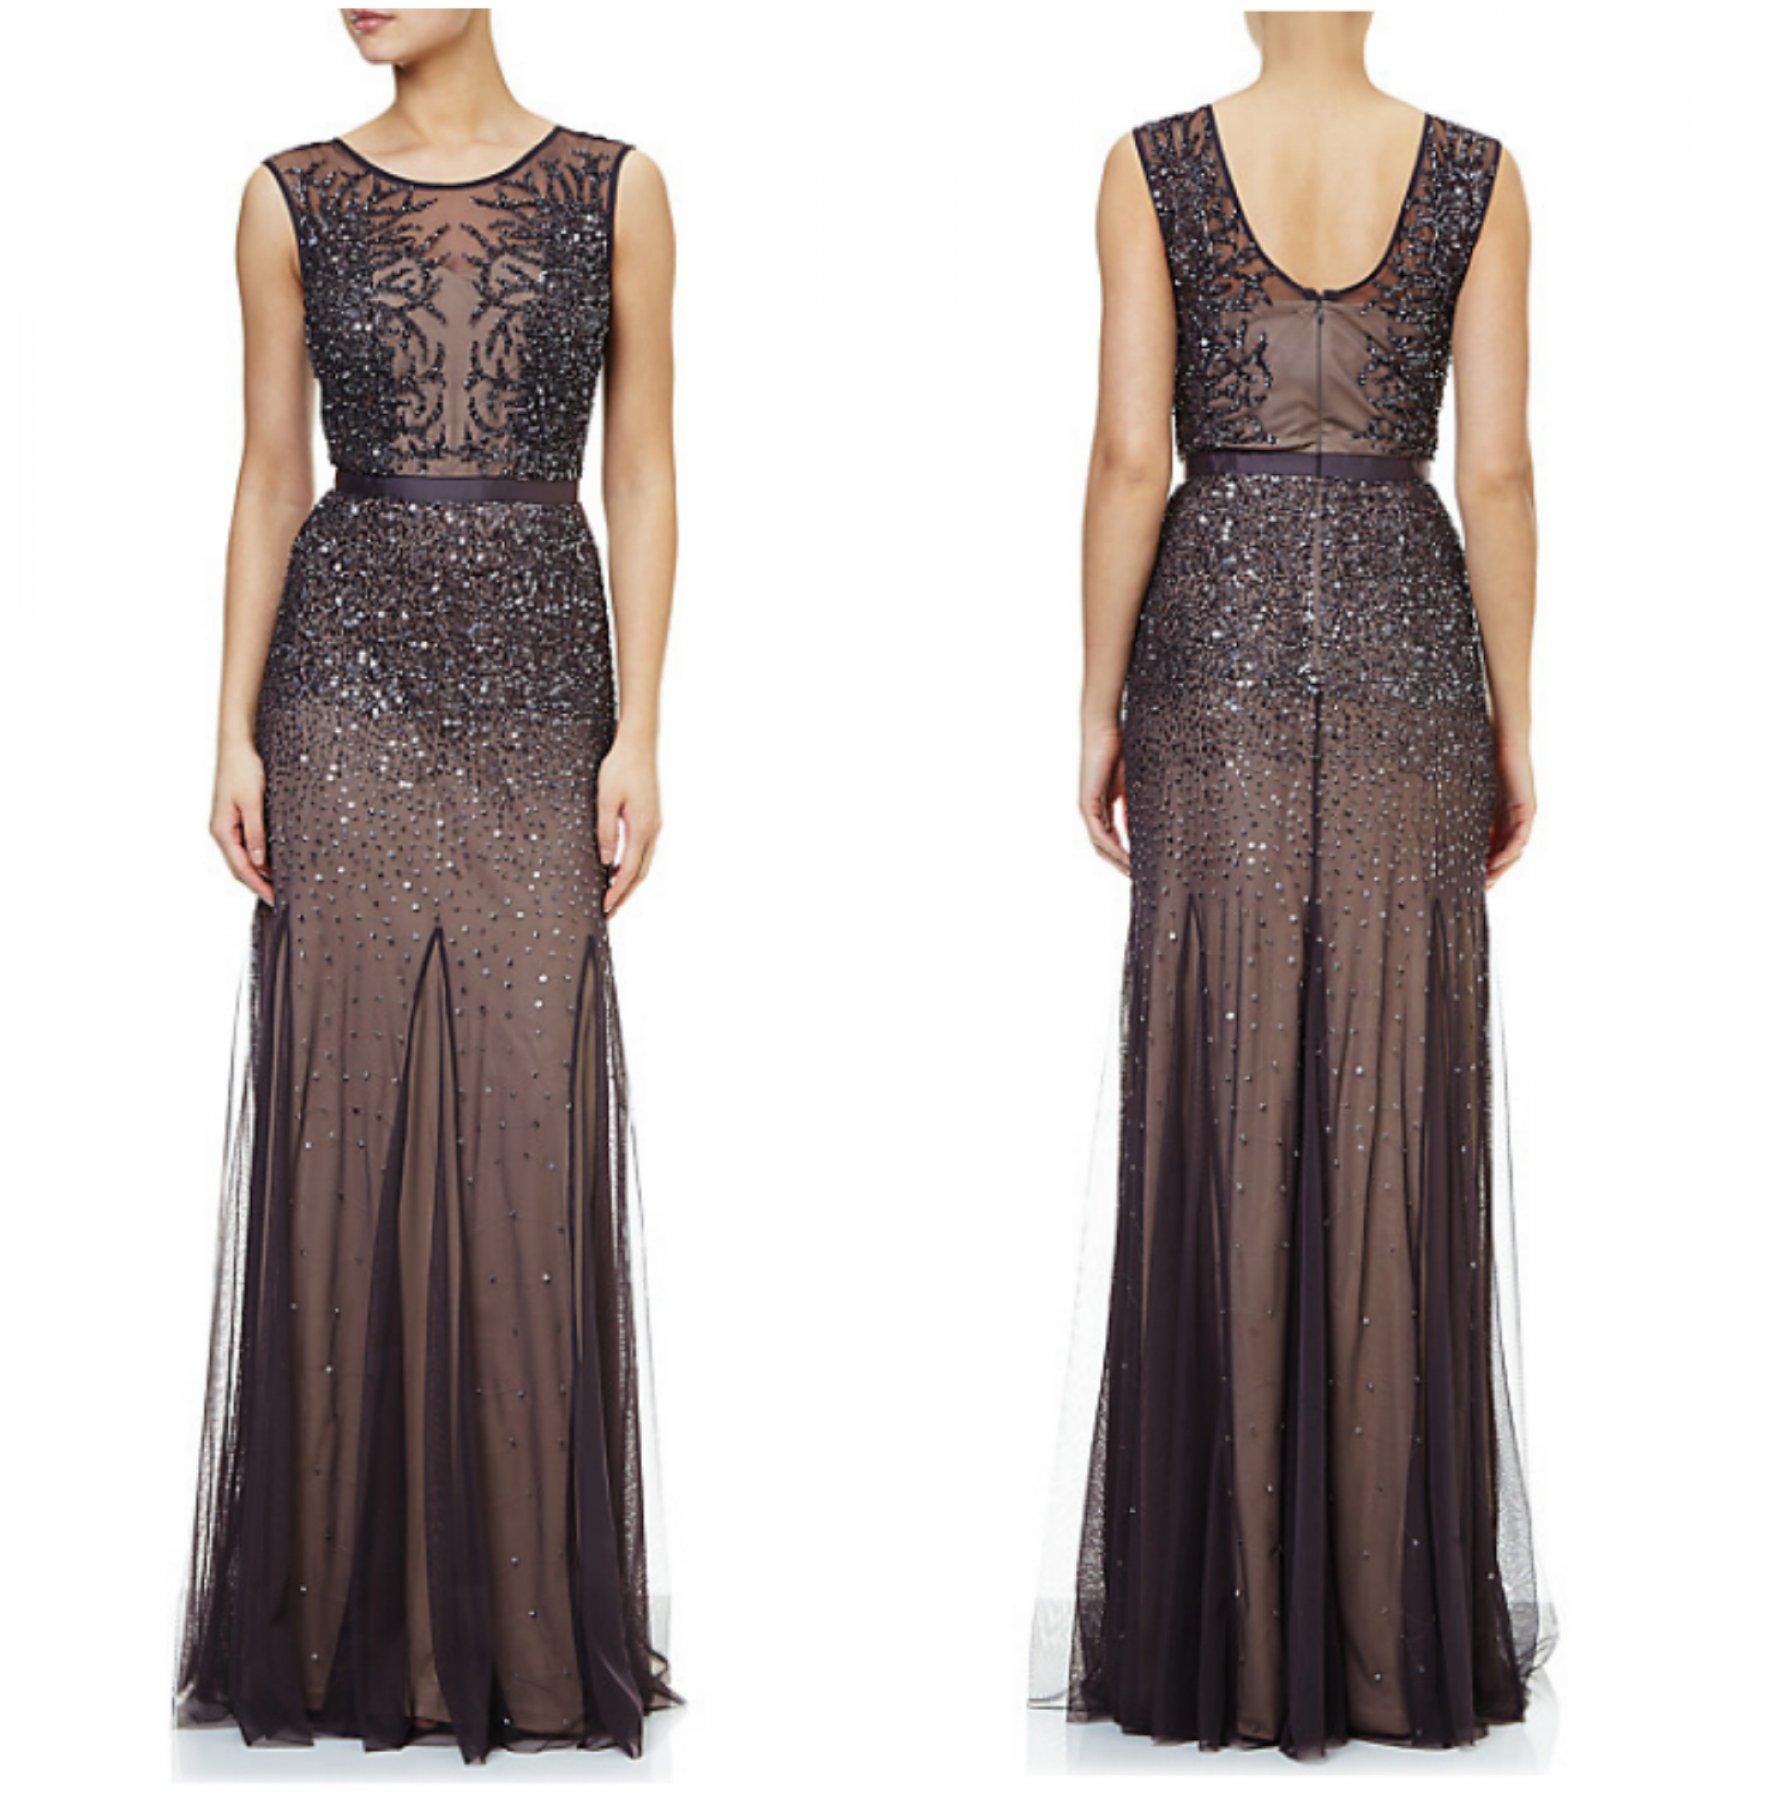 John Lewis Ladies Fashion Dresses